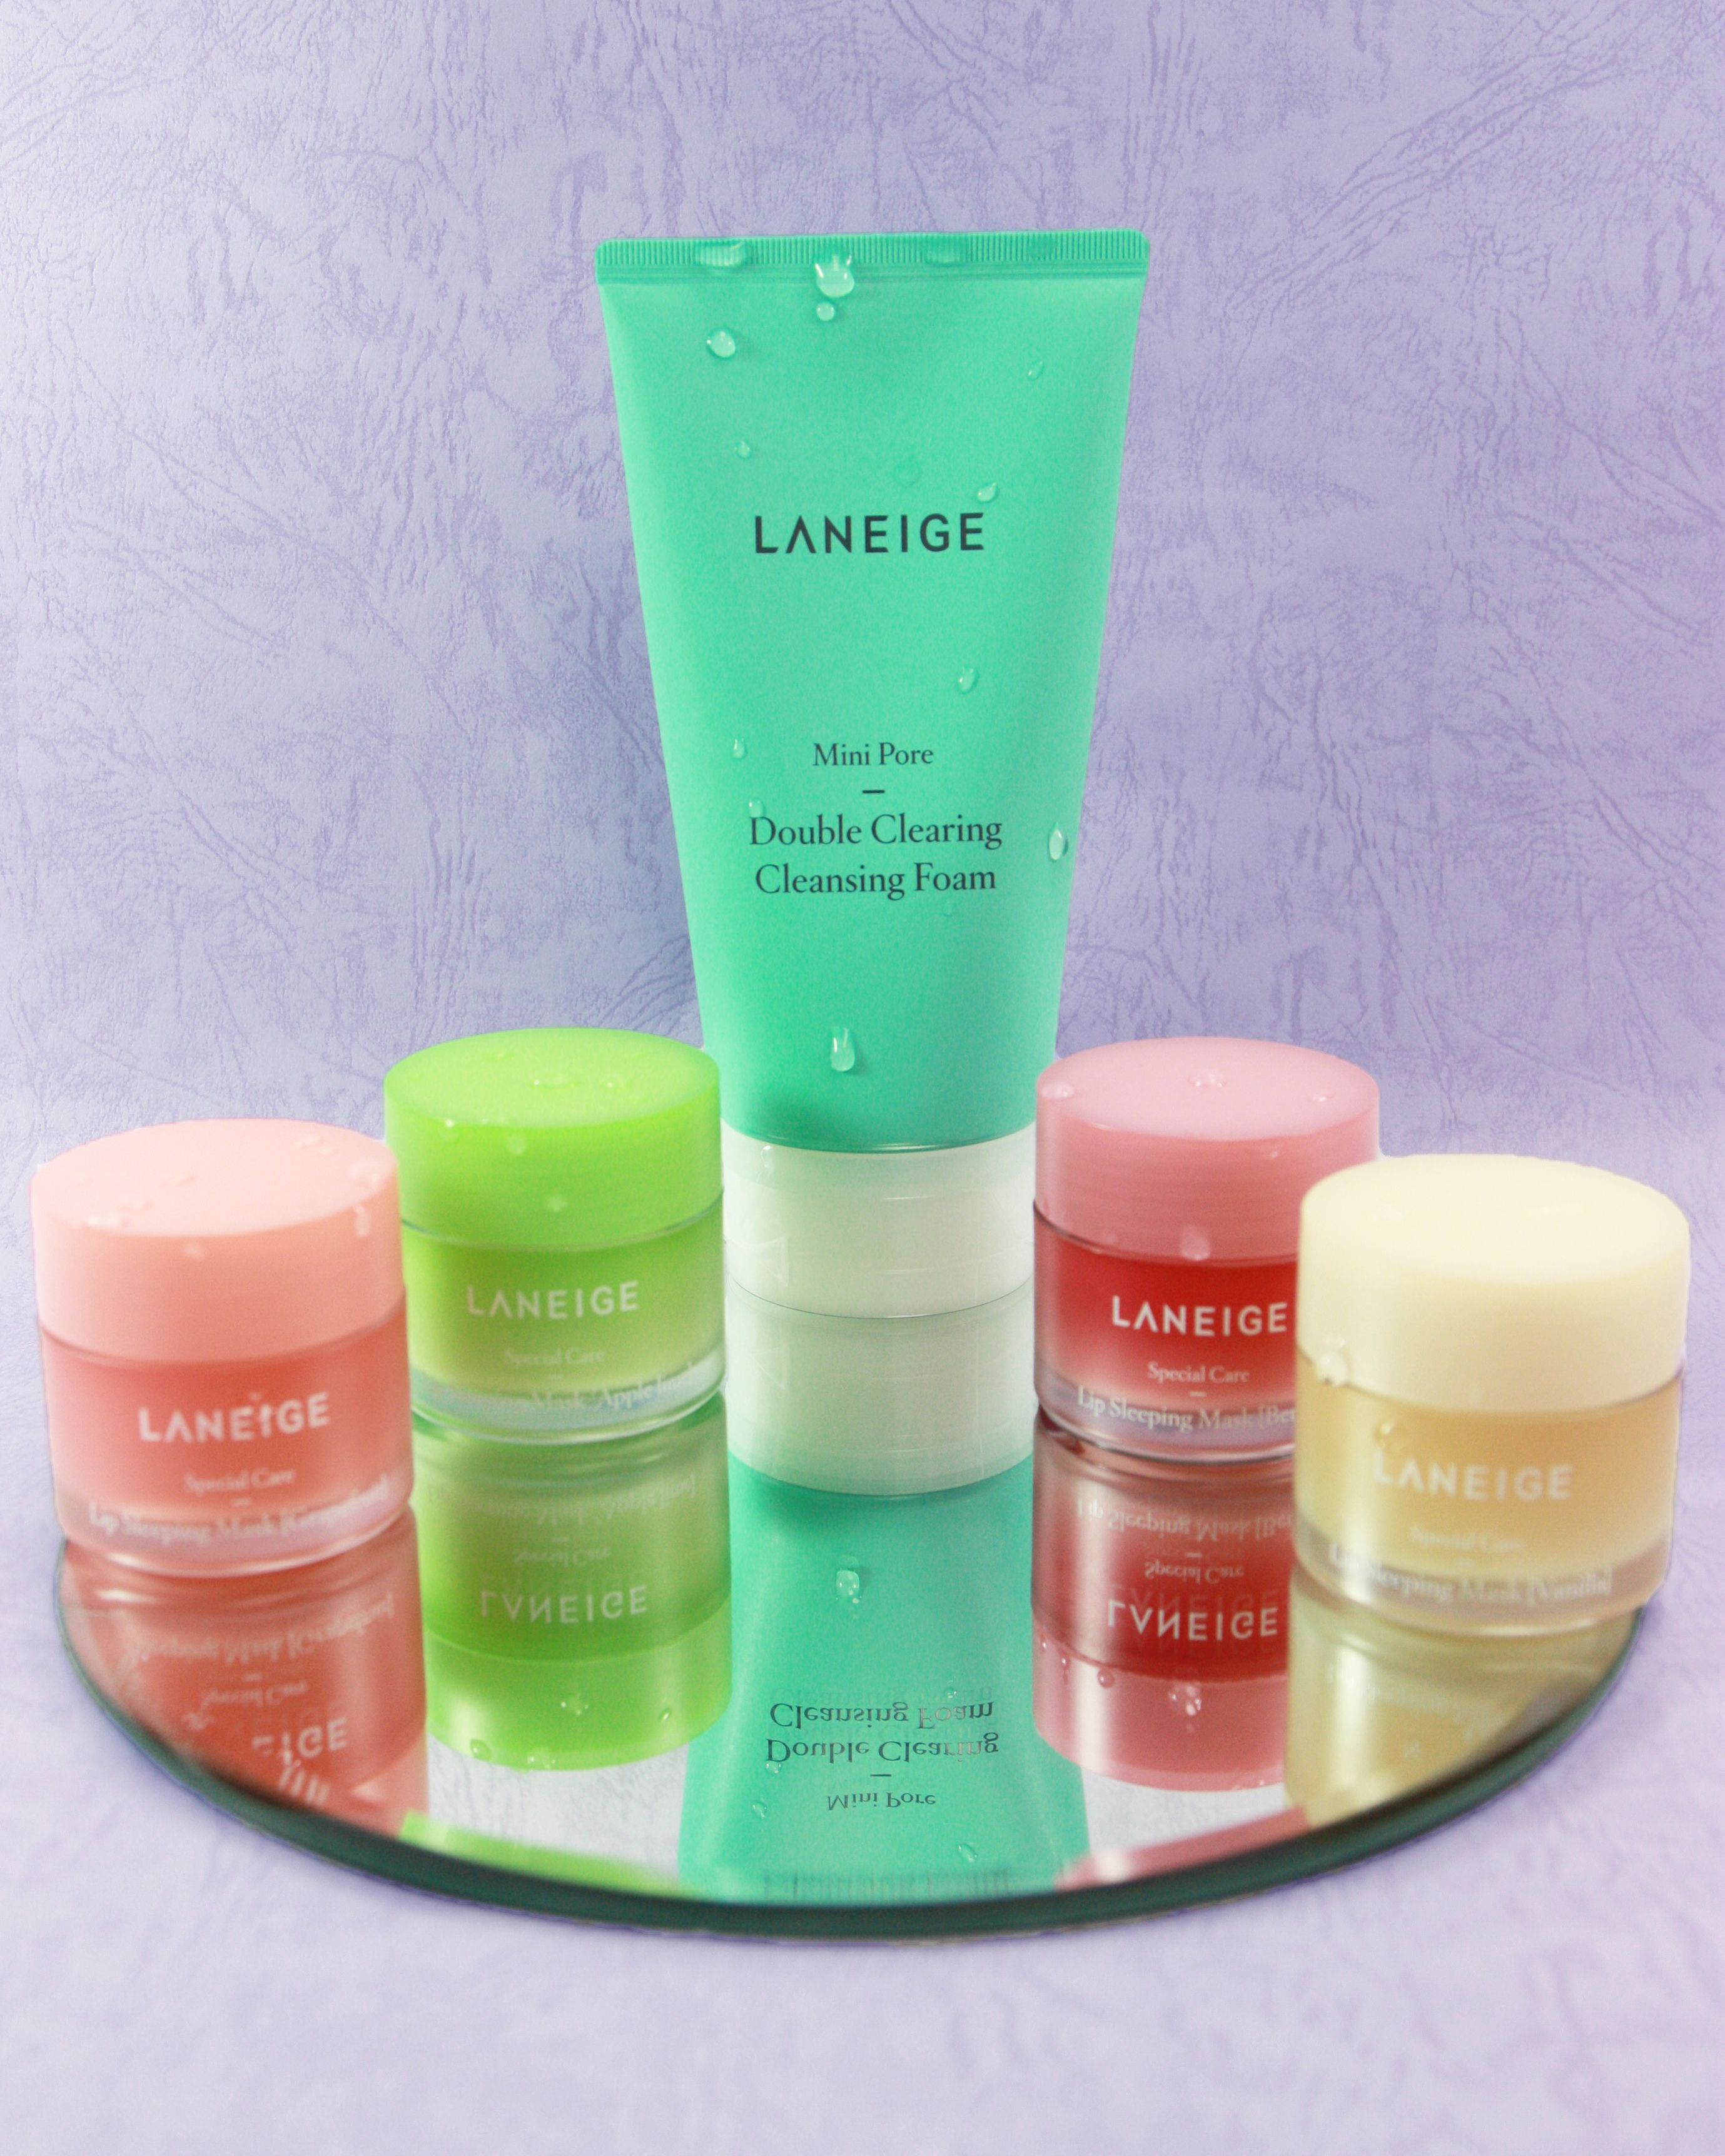 Laneige 라네즈 • Founded in 1994. Laneige is a Korean beauty